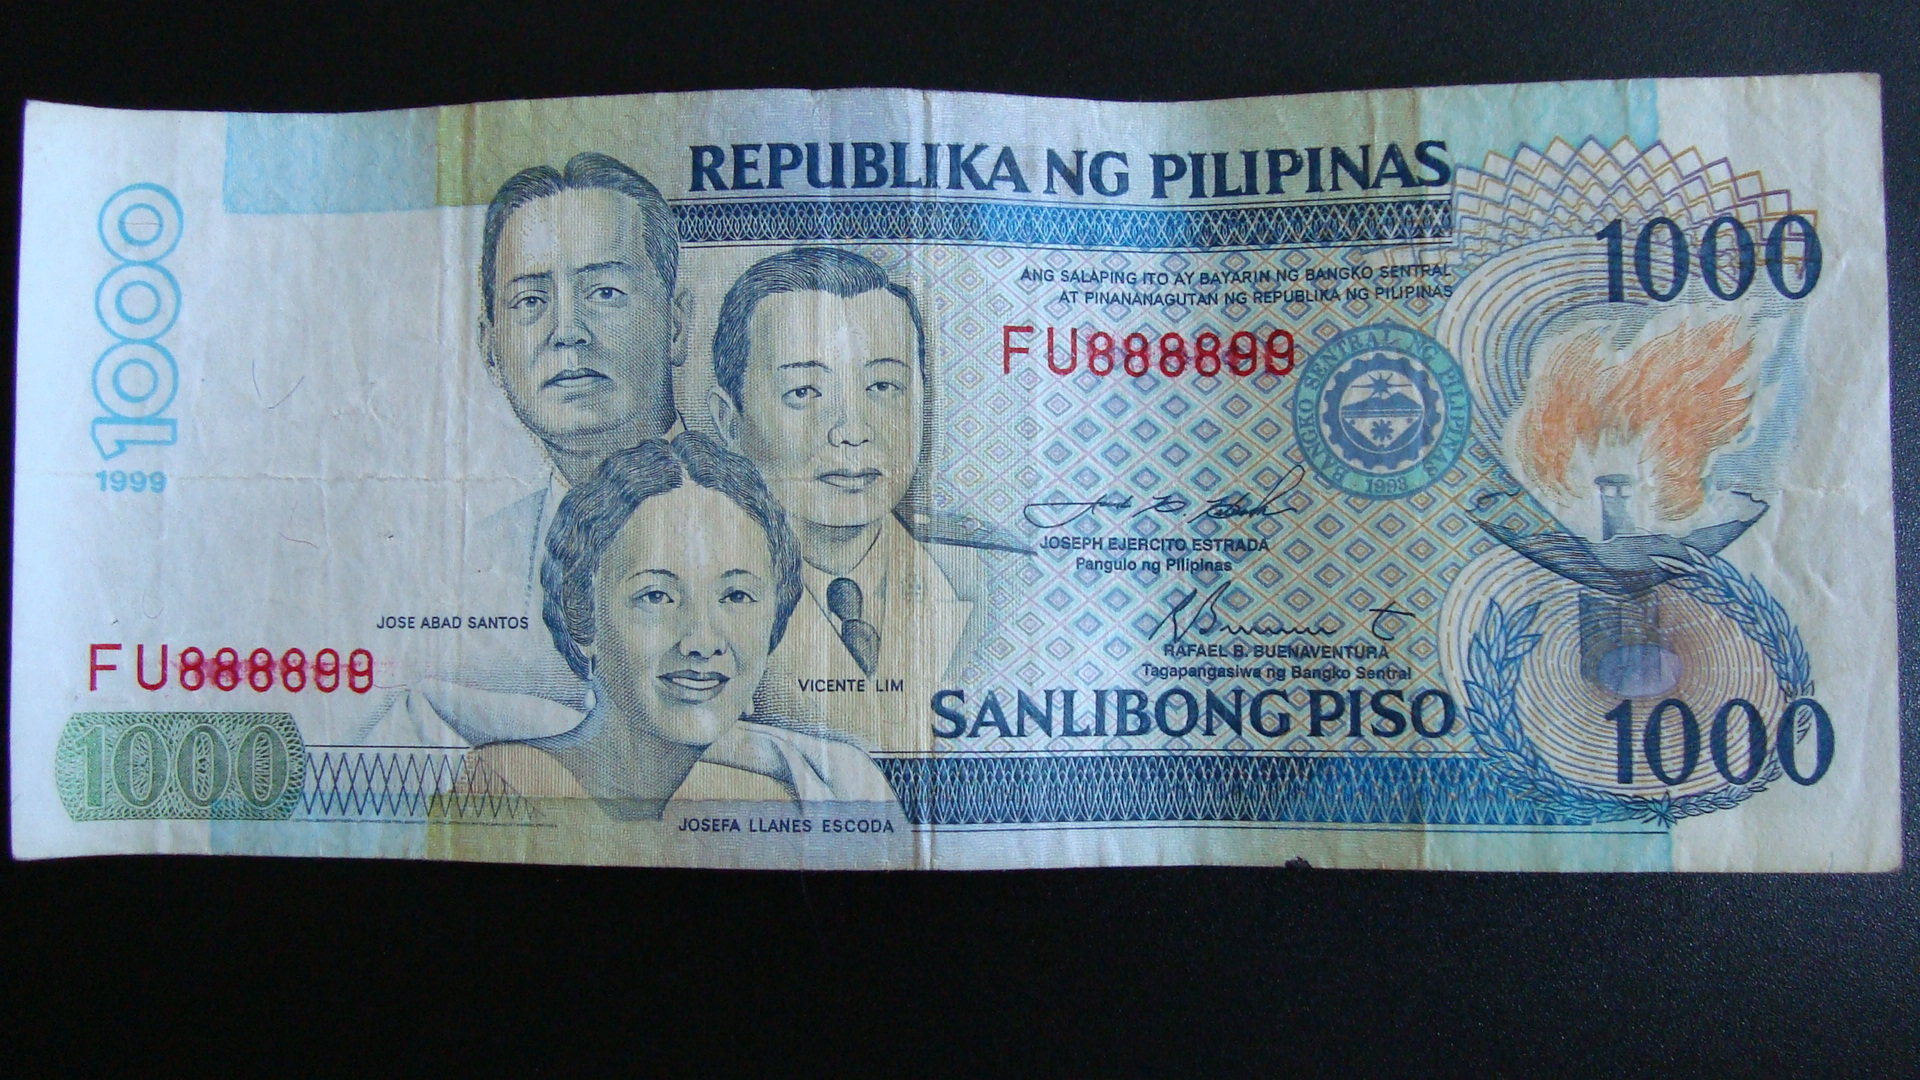 One Thousand Pesos Down The Drain